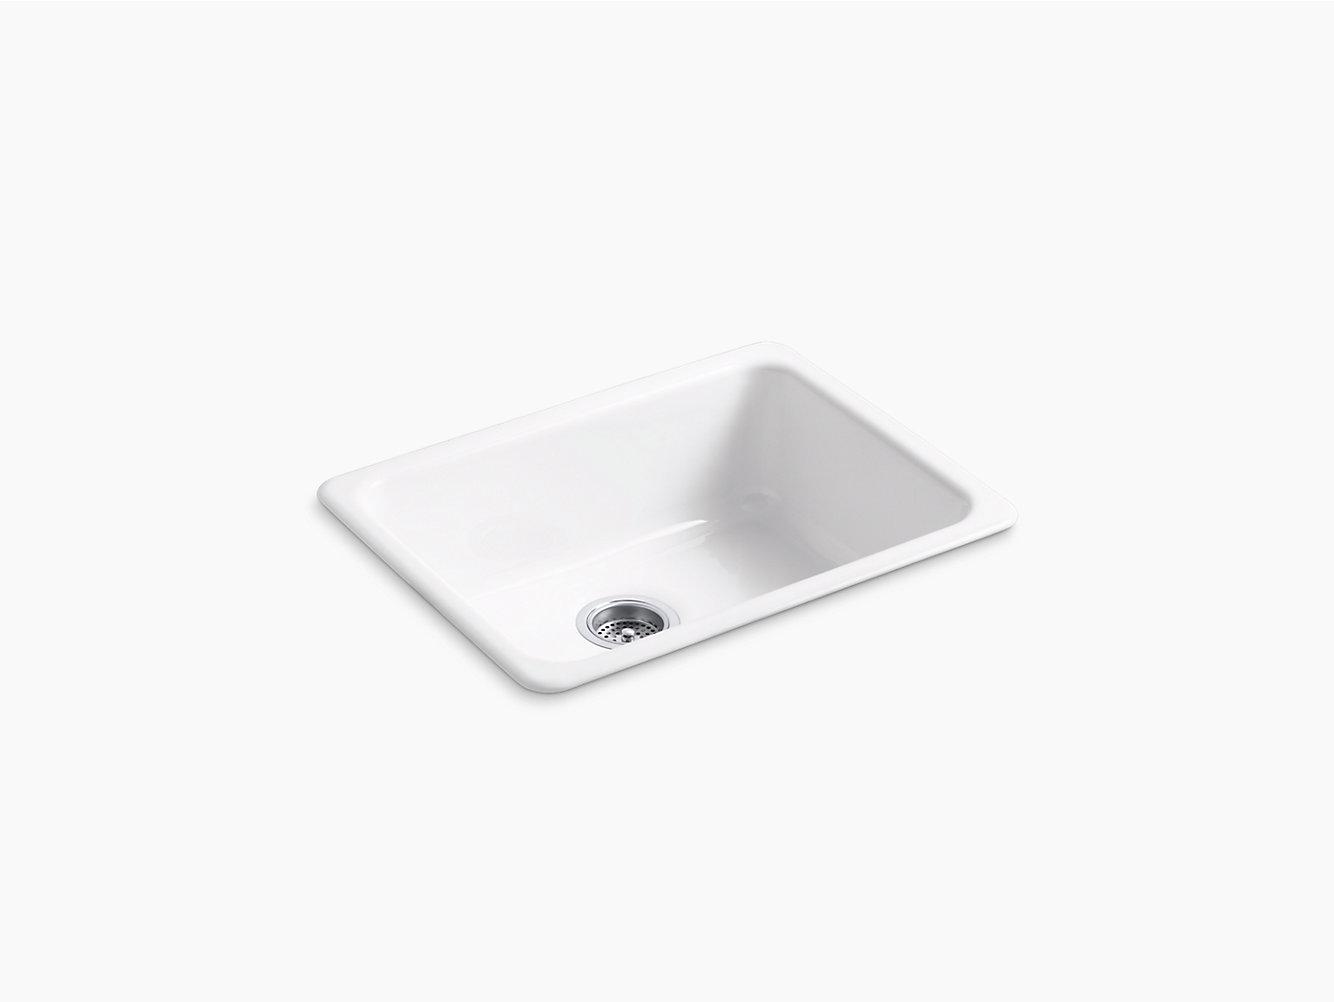 Kohler 6585 Iron Tones 24 1 4 X 18 3 8 Top Mount Under Single Bowl Kitchen Sink